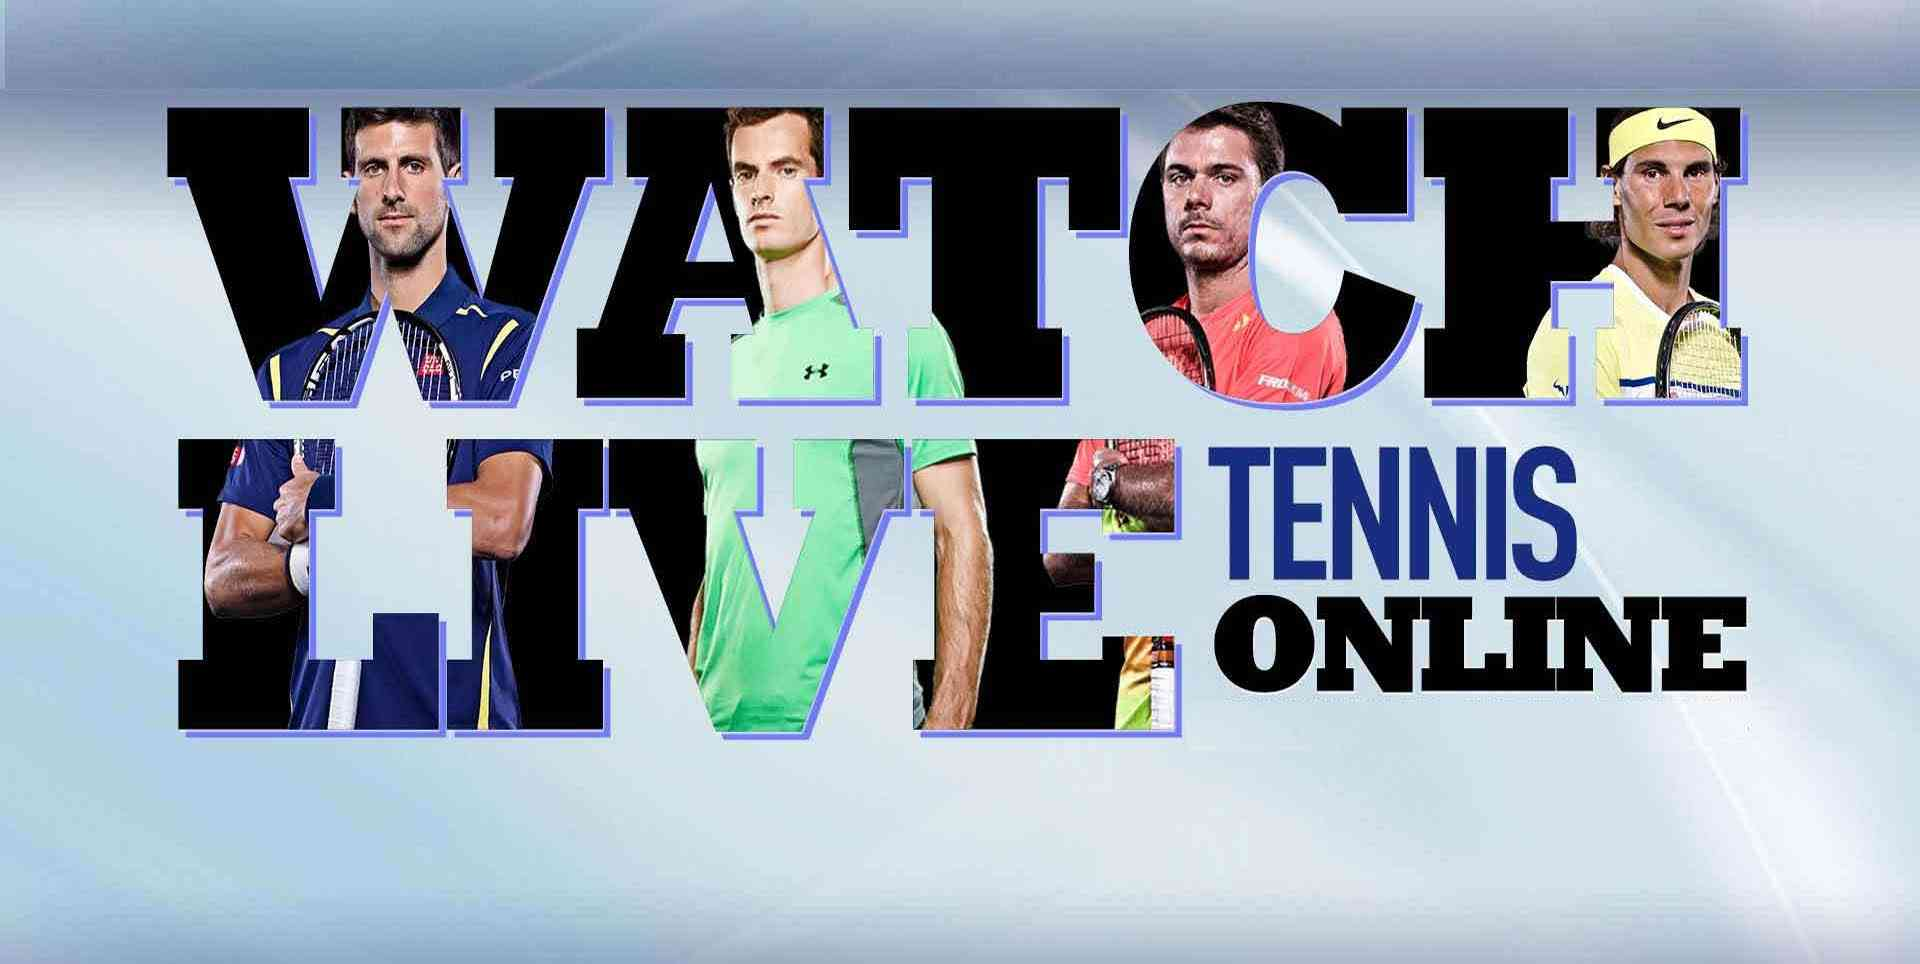 Watch Semifinal S. Hsieh | S. Peng vs G. Muguruza | C. Suarez Navarro Online